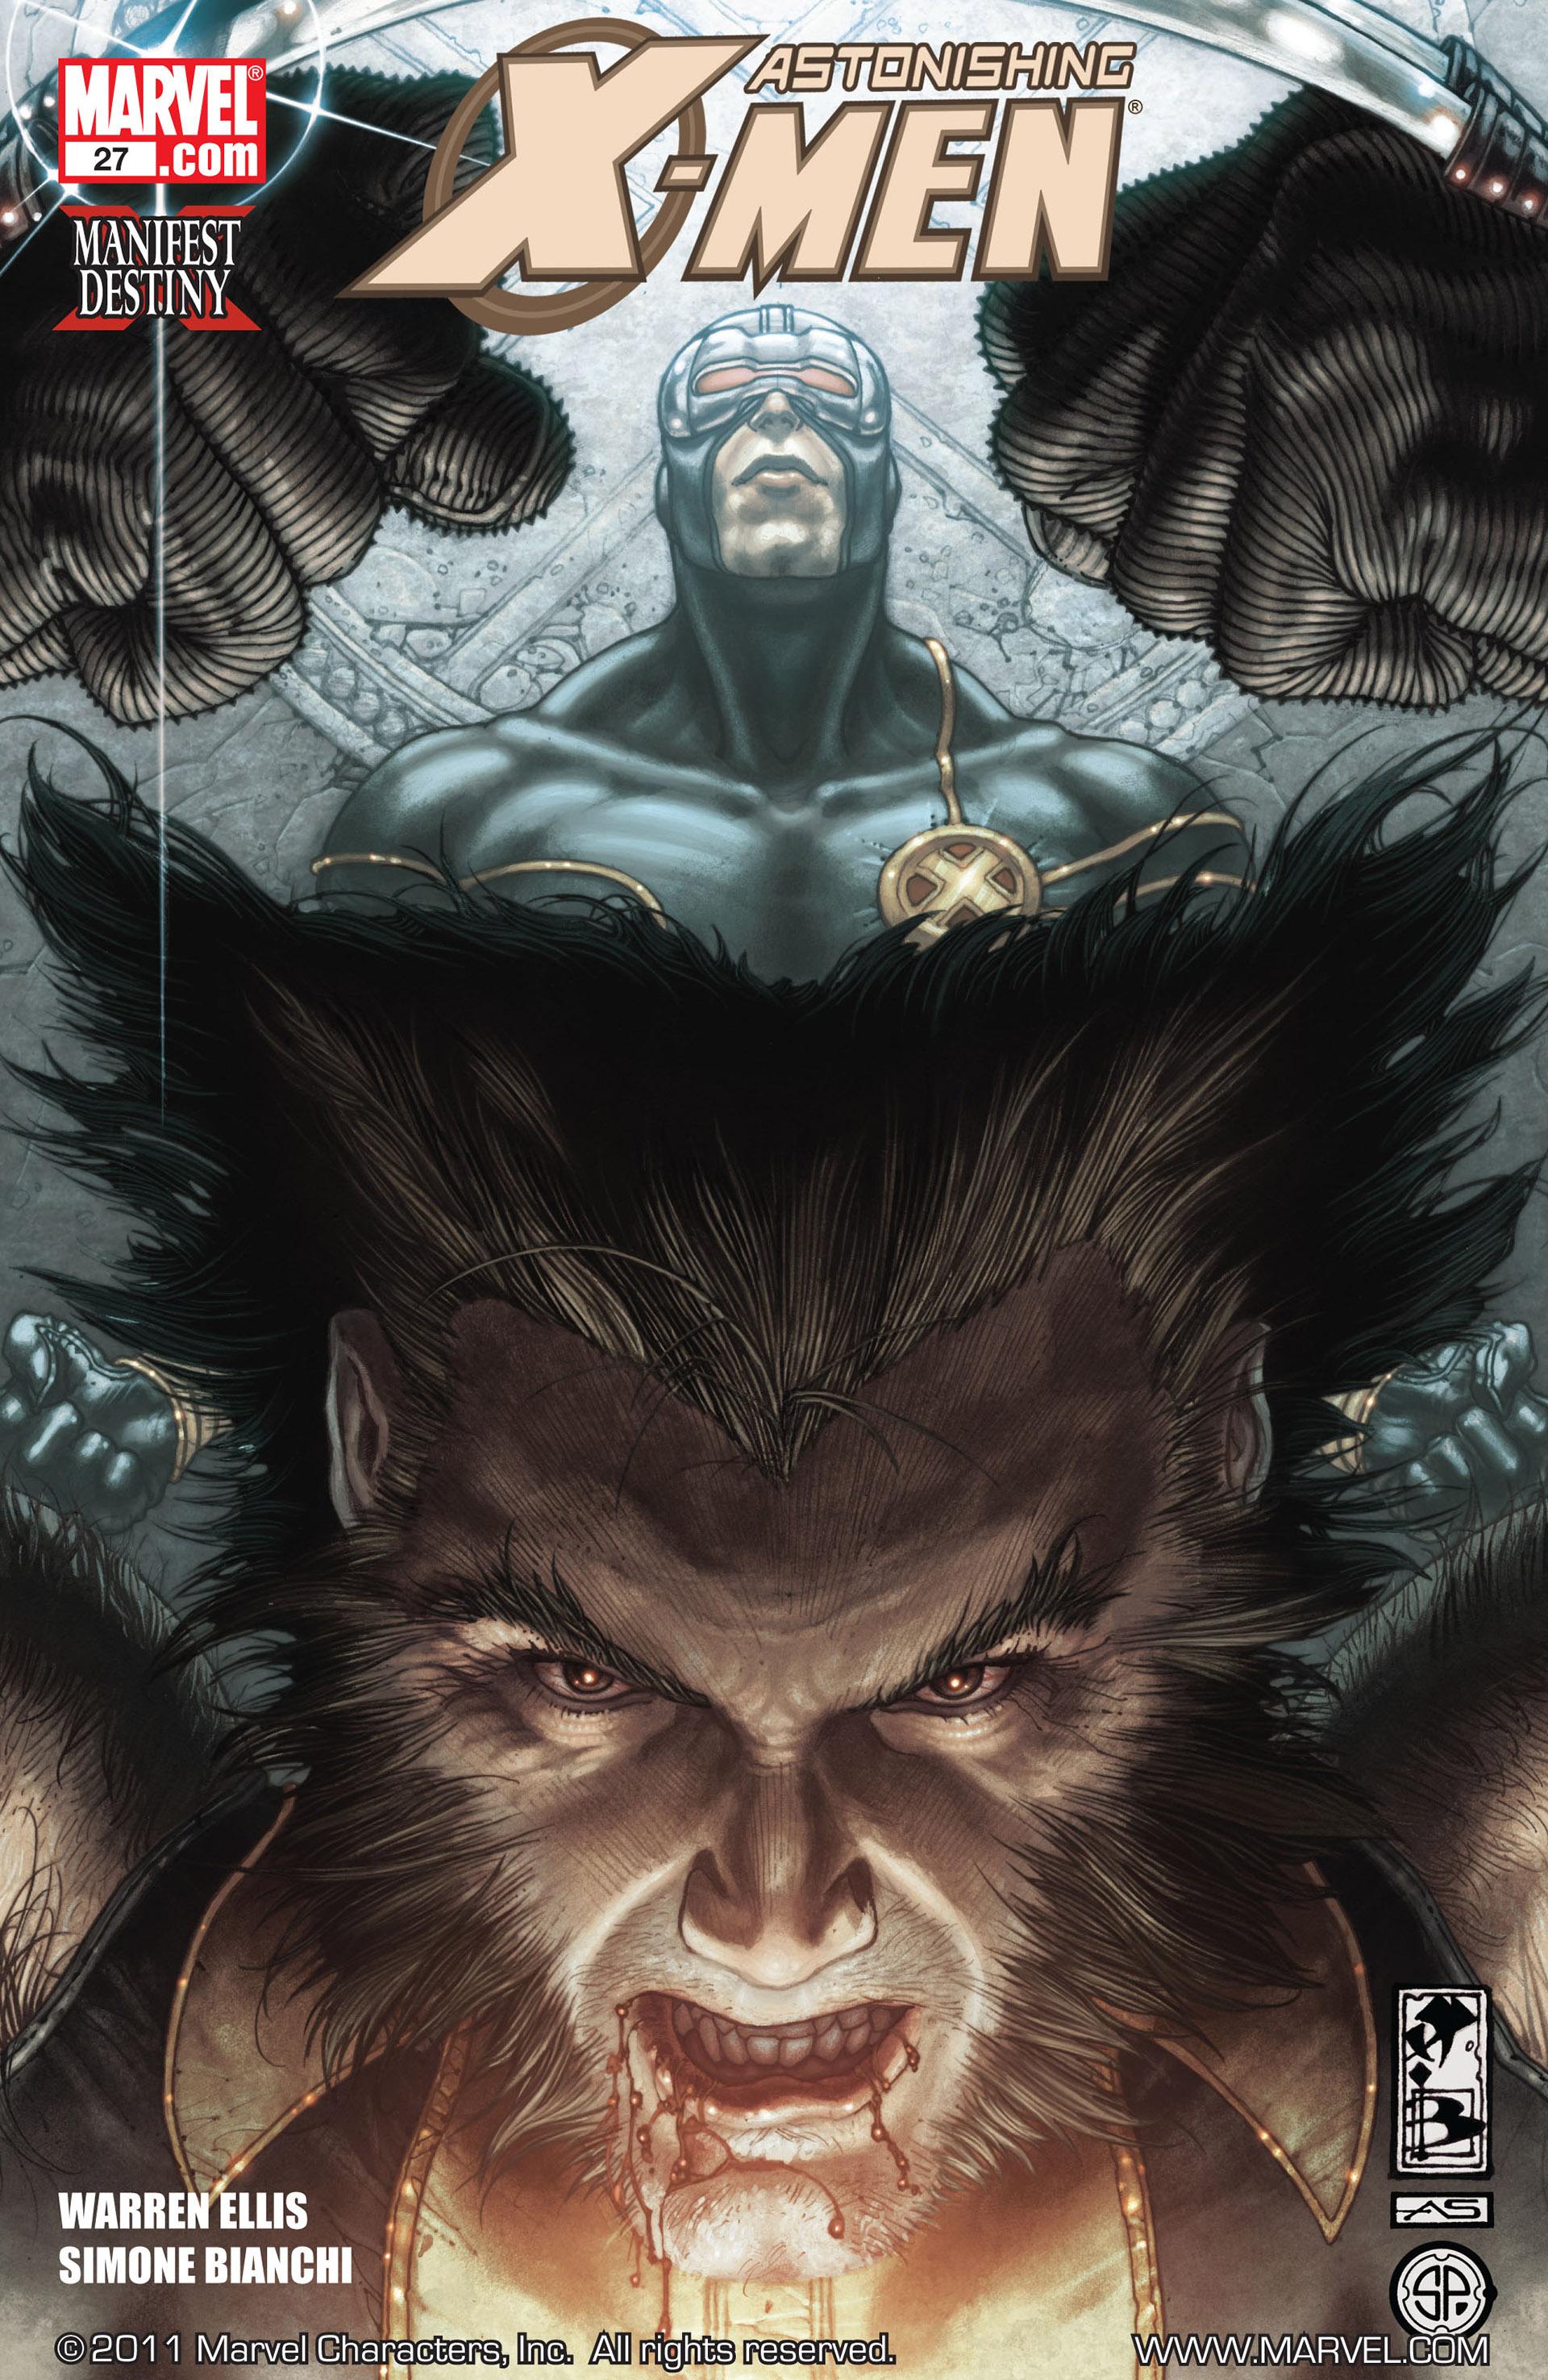 Astonishing X-Men (2004) 27 Page 1